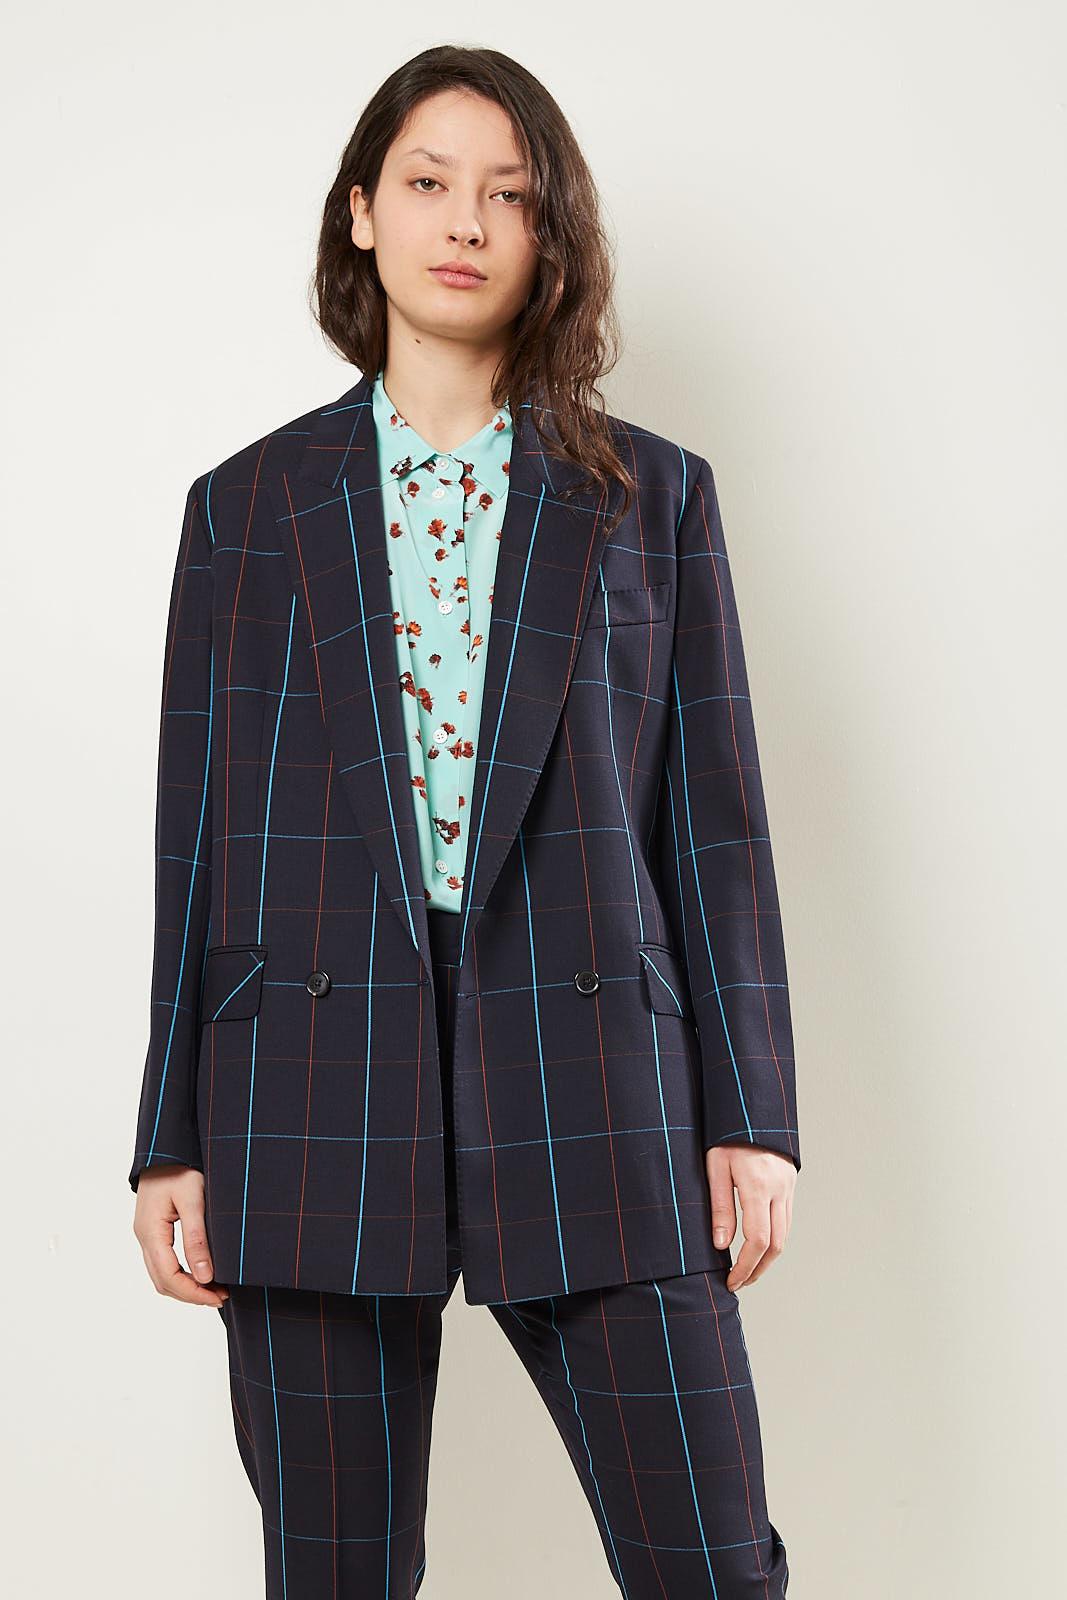 Paul Smith - Womens jacket